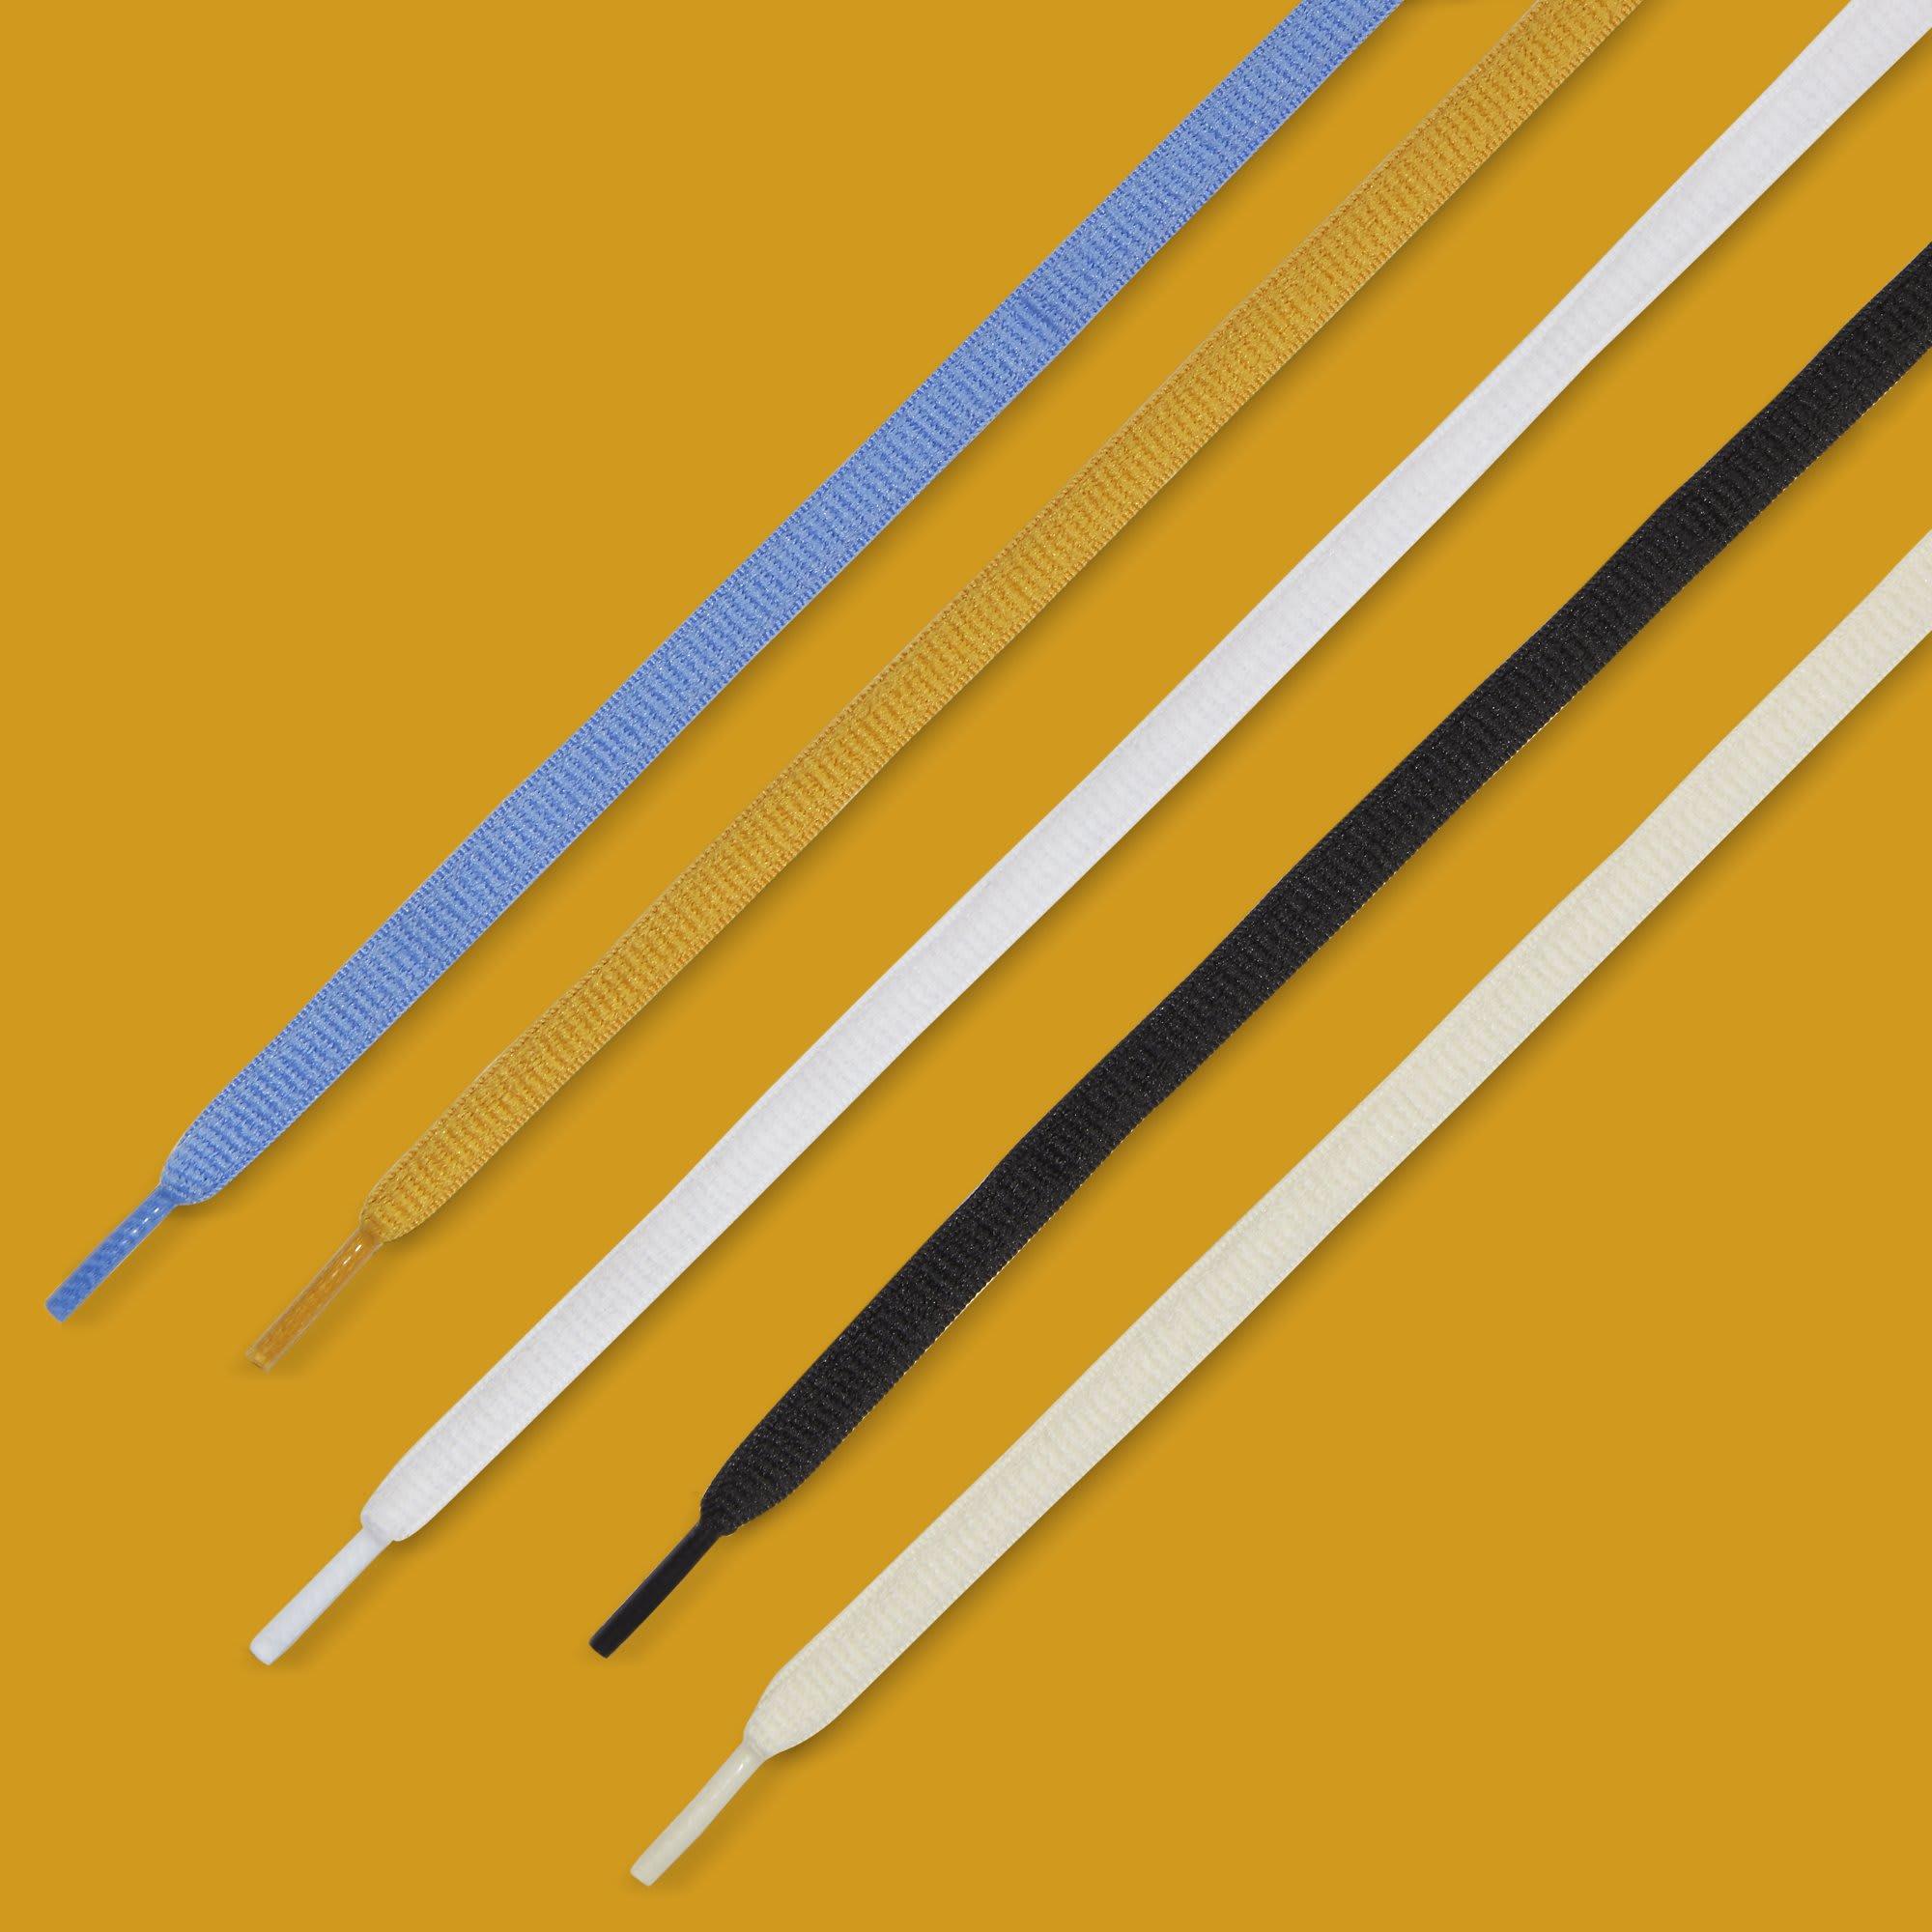 Carpet Company x Nike SB Dunk High CV1677-100 Shoelaces